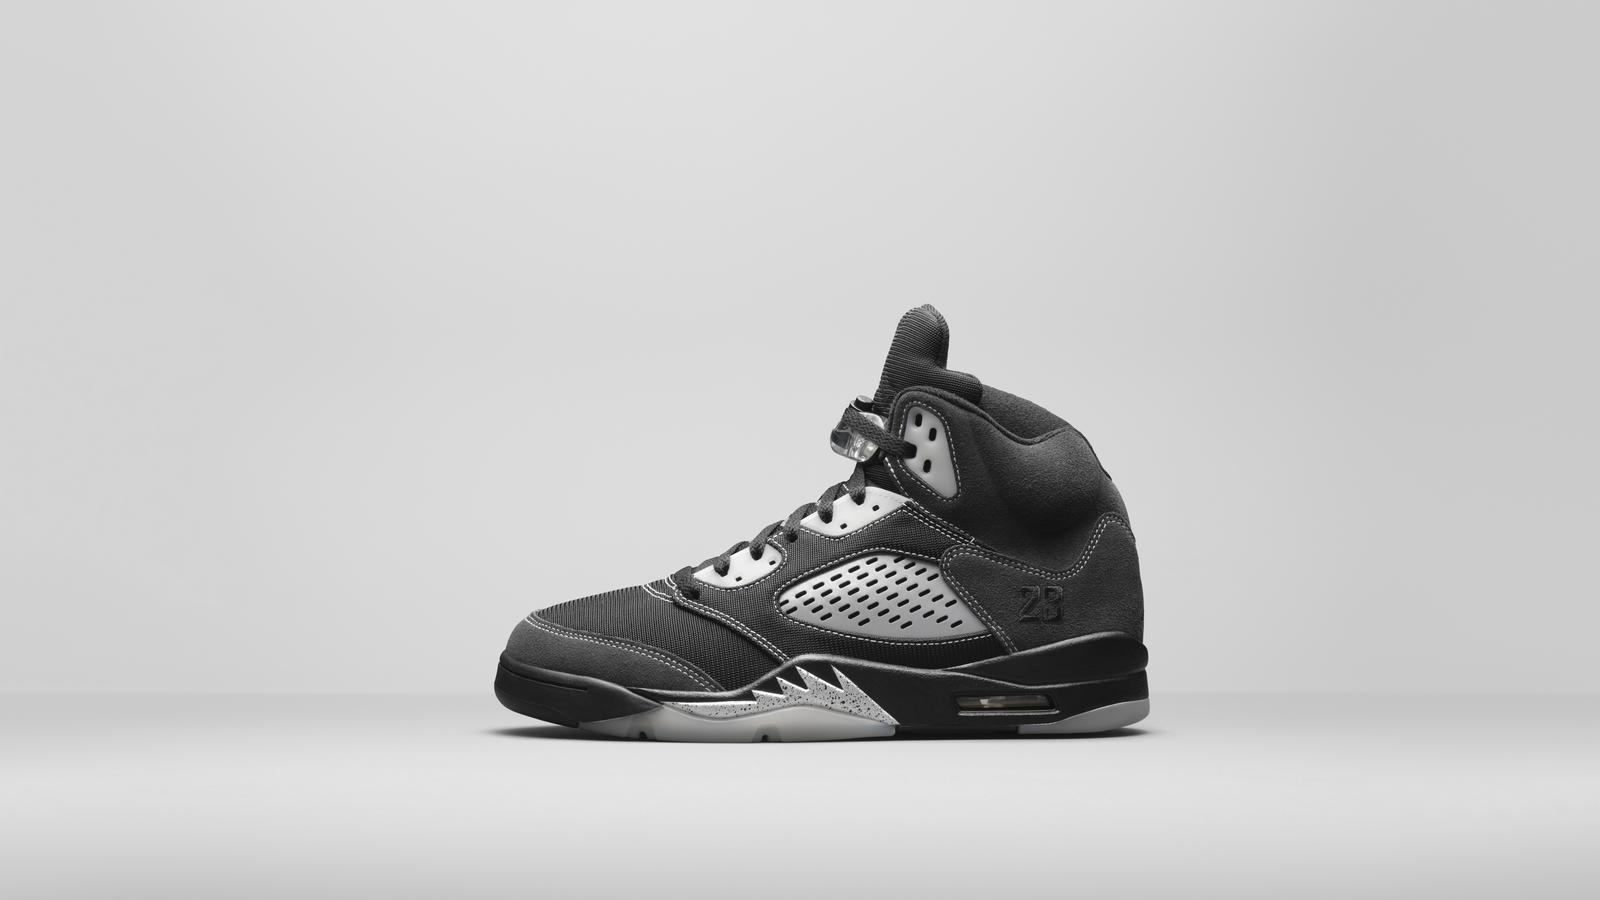 Jordan Brand Spring 2021 Retro Releases 5